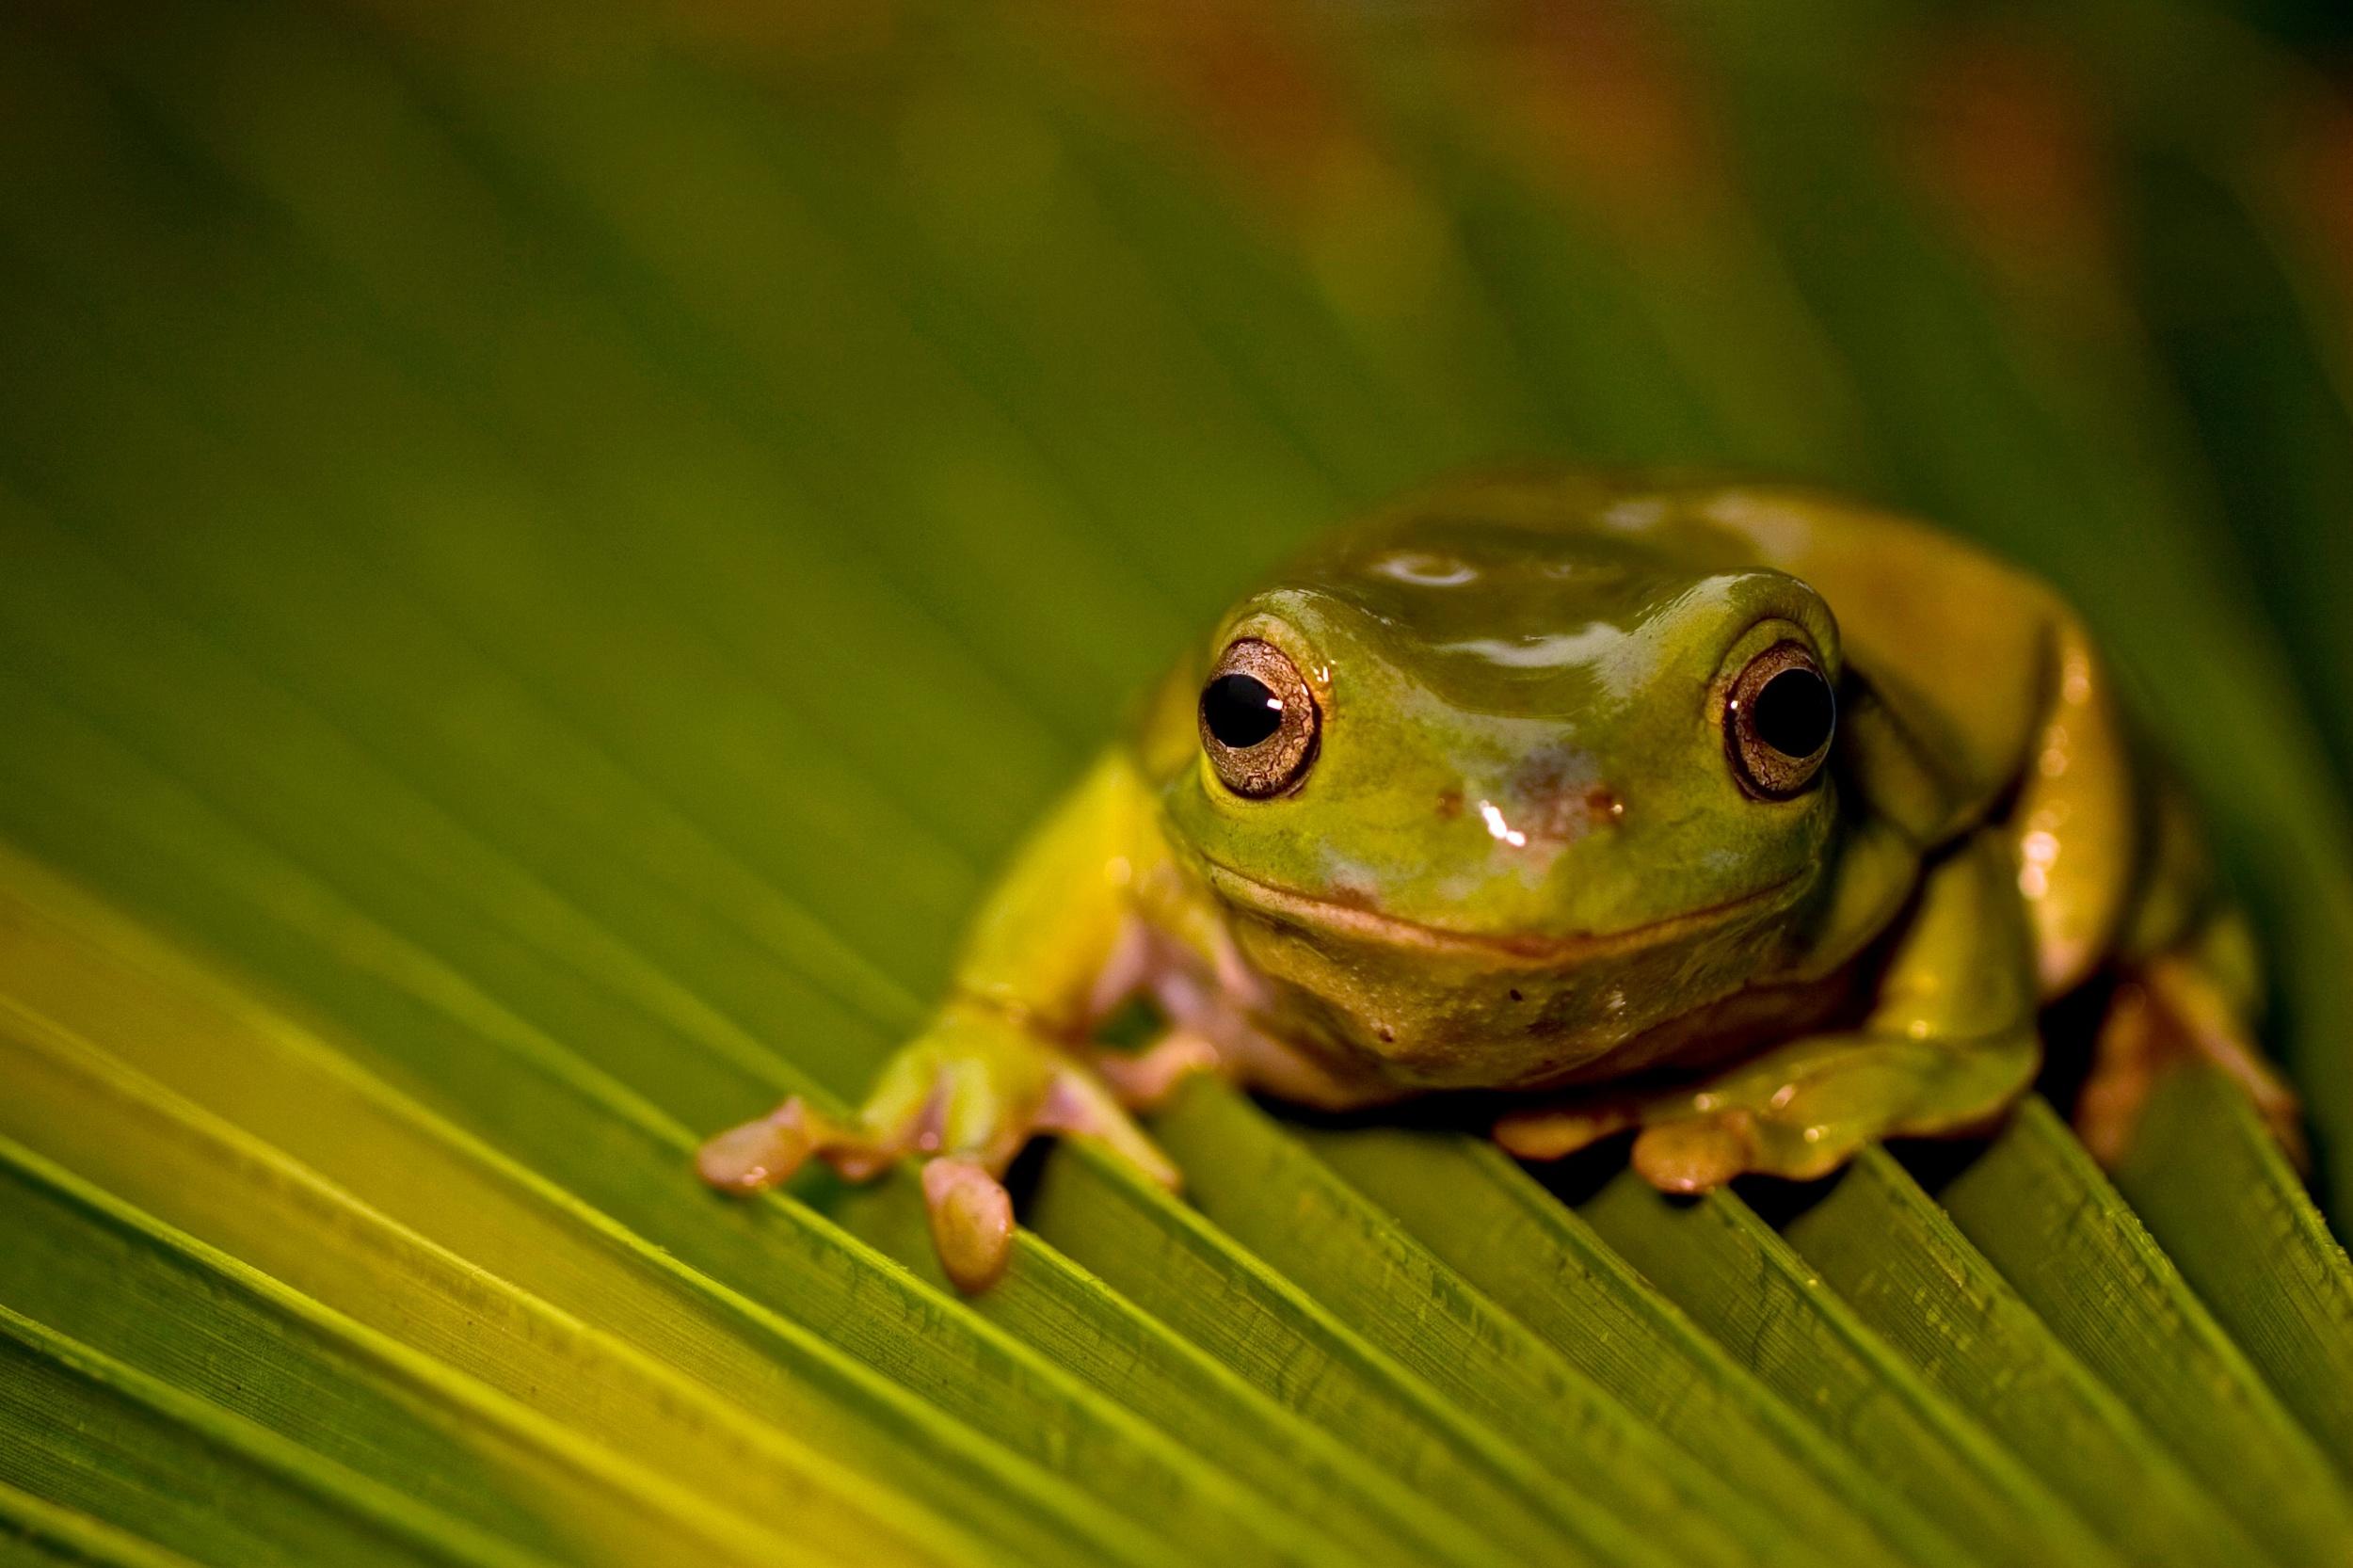 Australian green tree frog, captive. (Santa Barbara, Calif.)